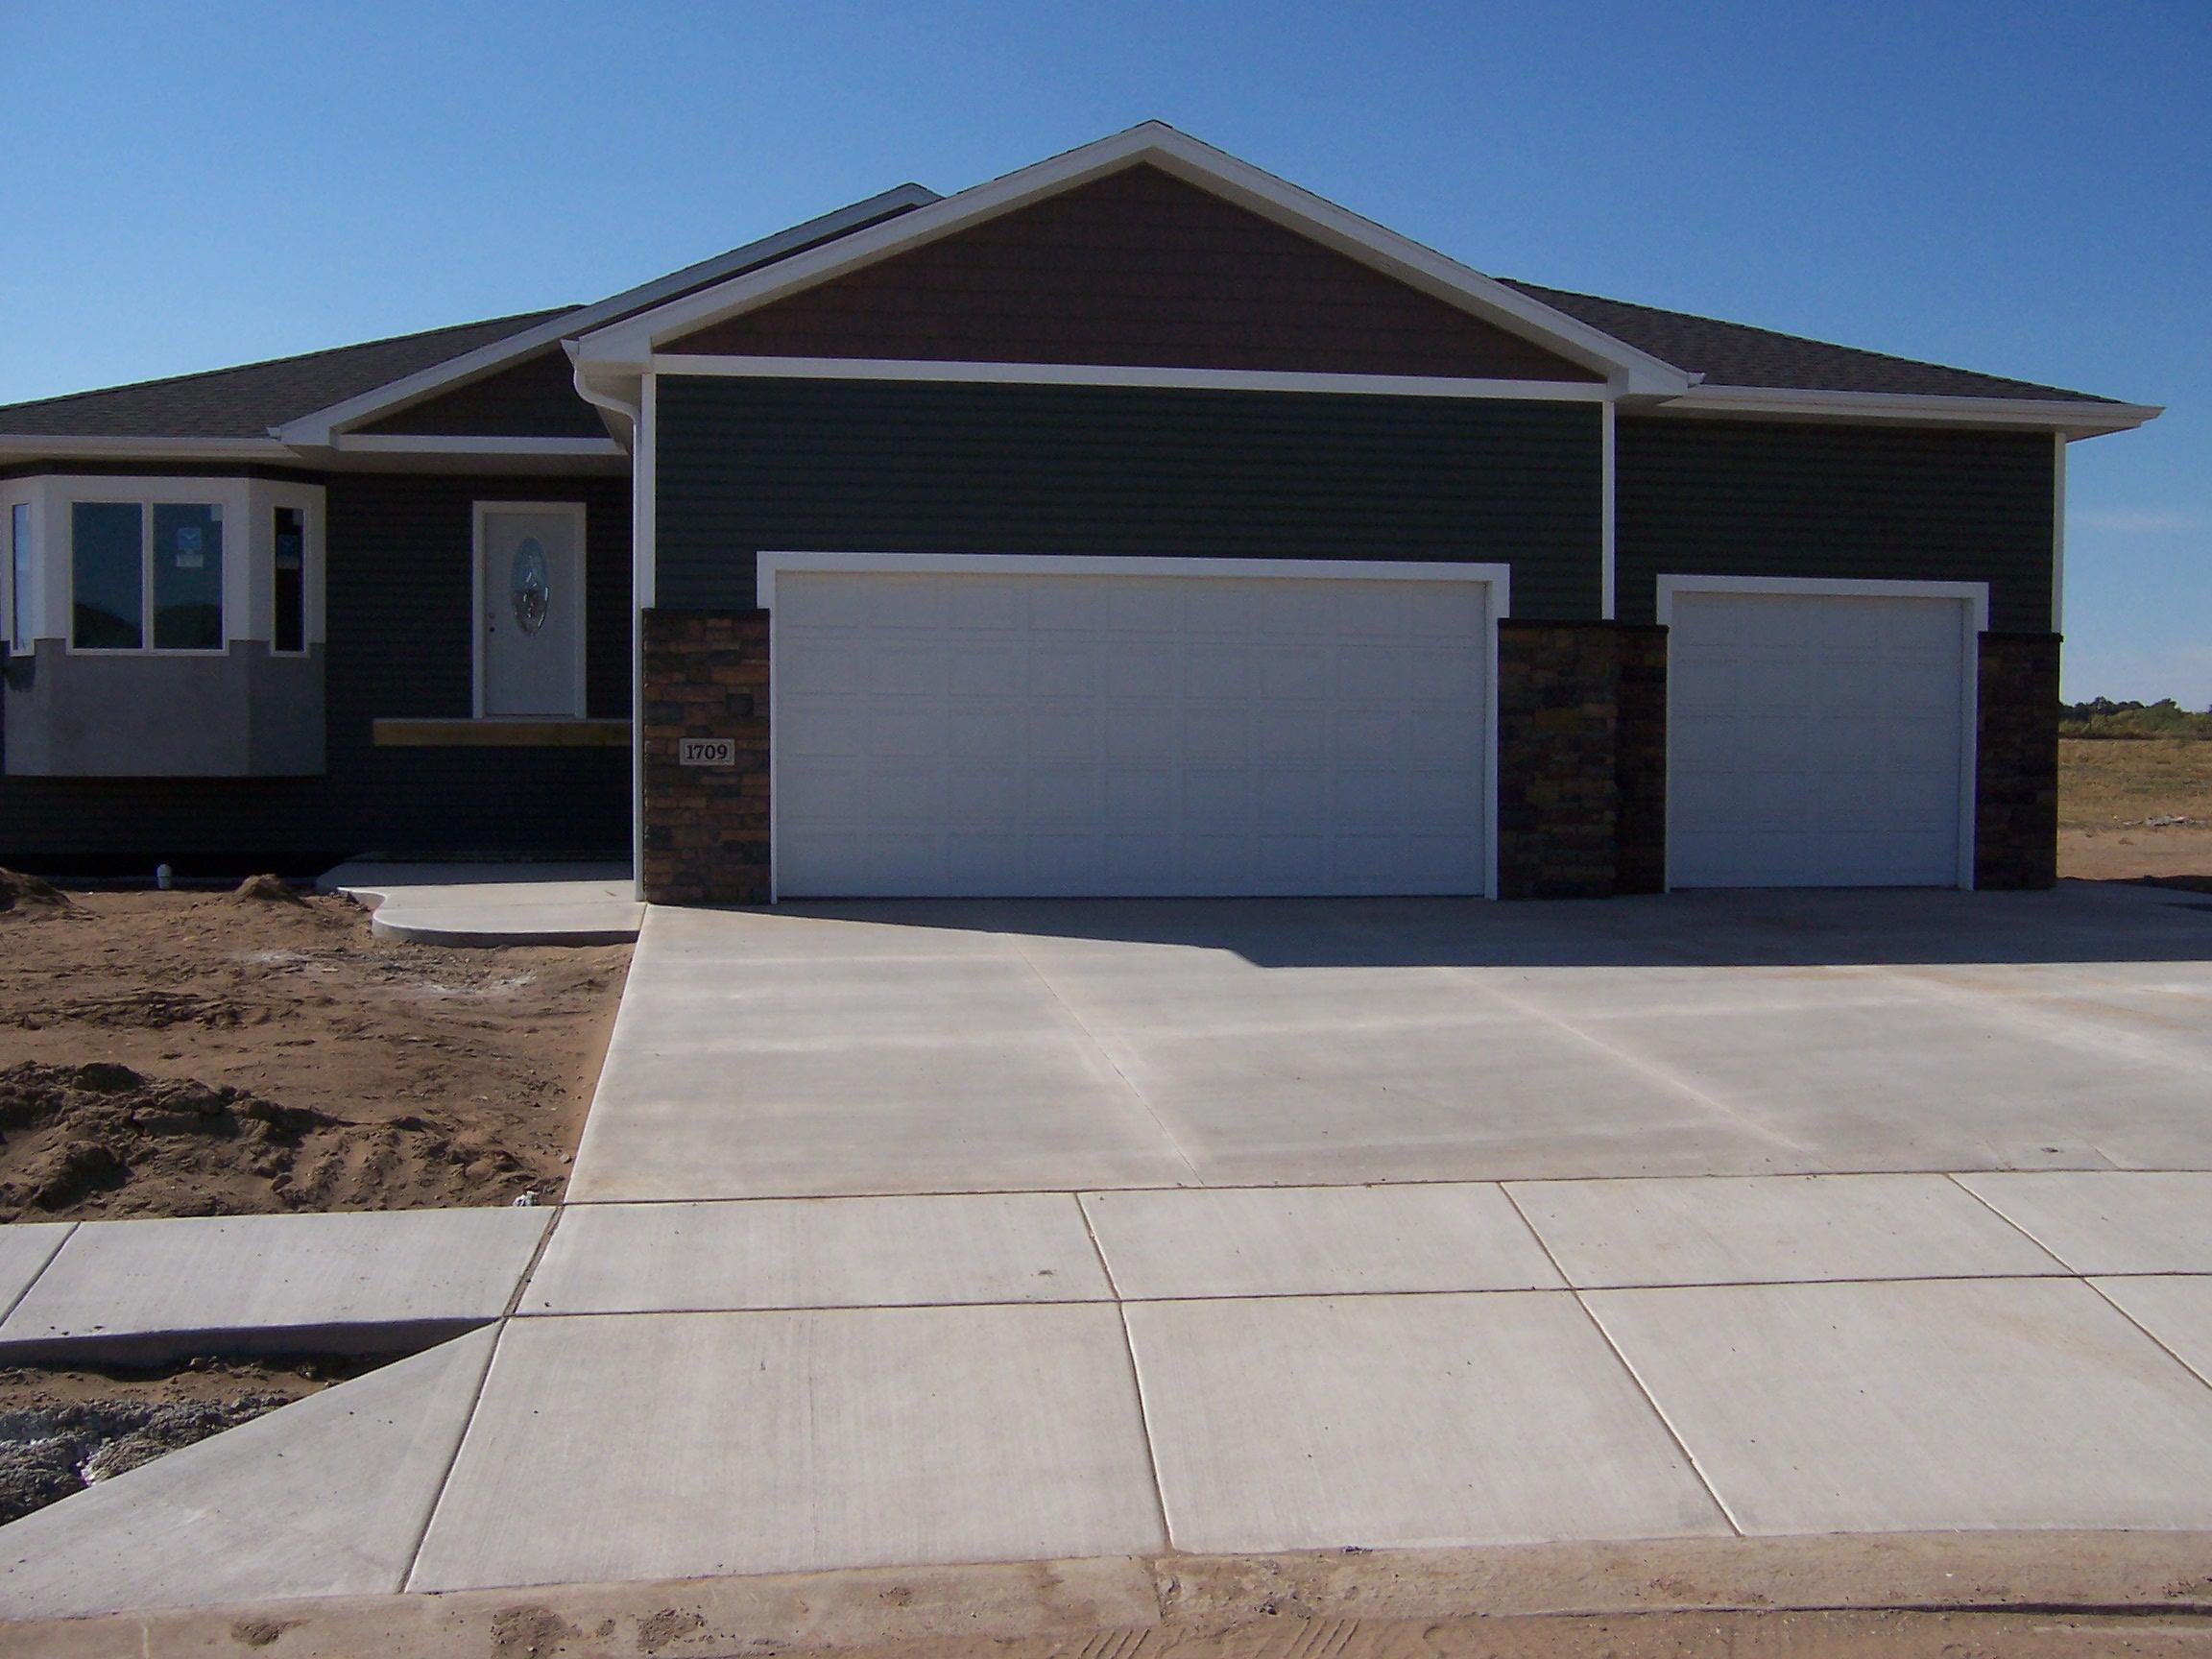 1709 Amber Pl, Mandan, North Dakota 58554